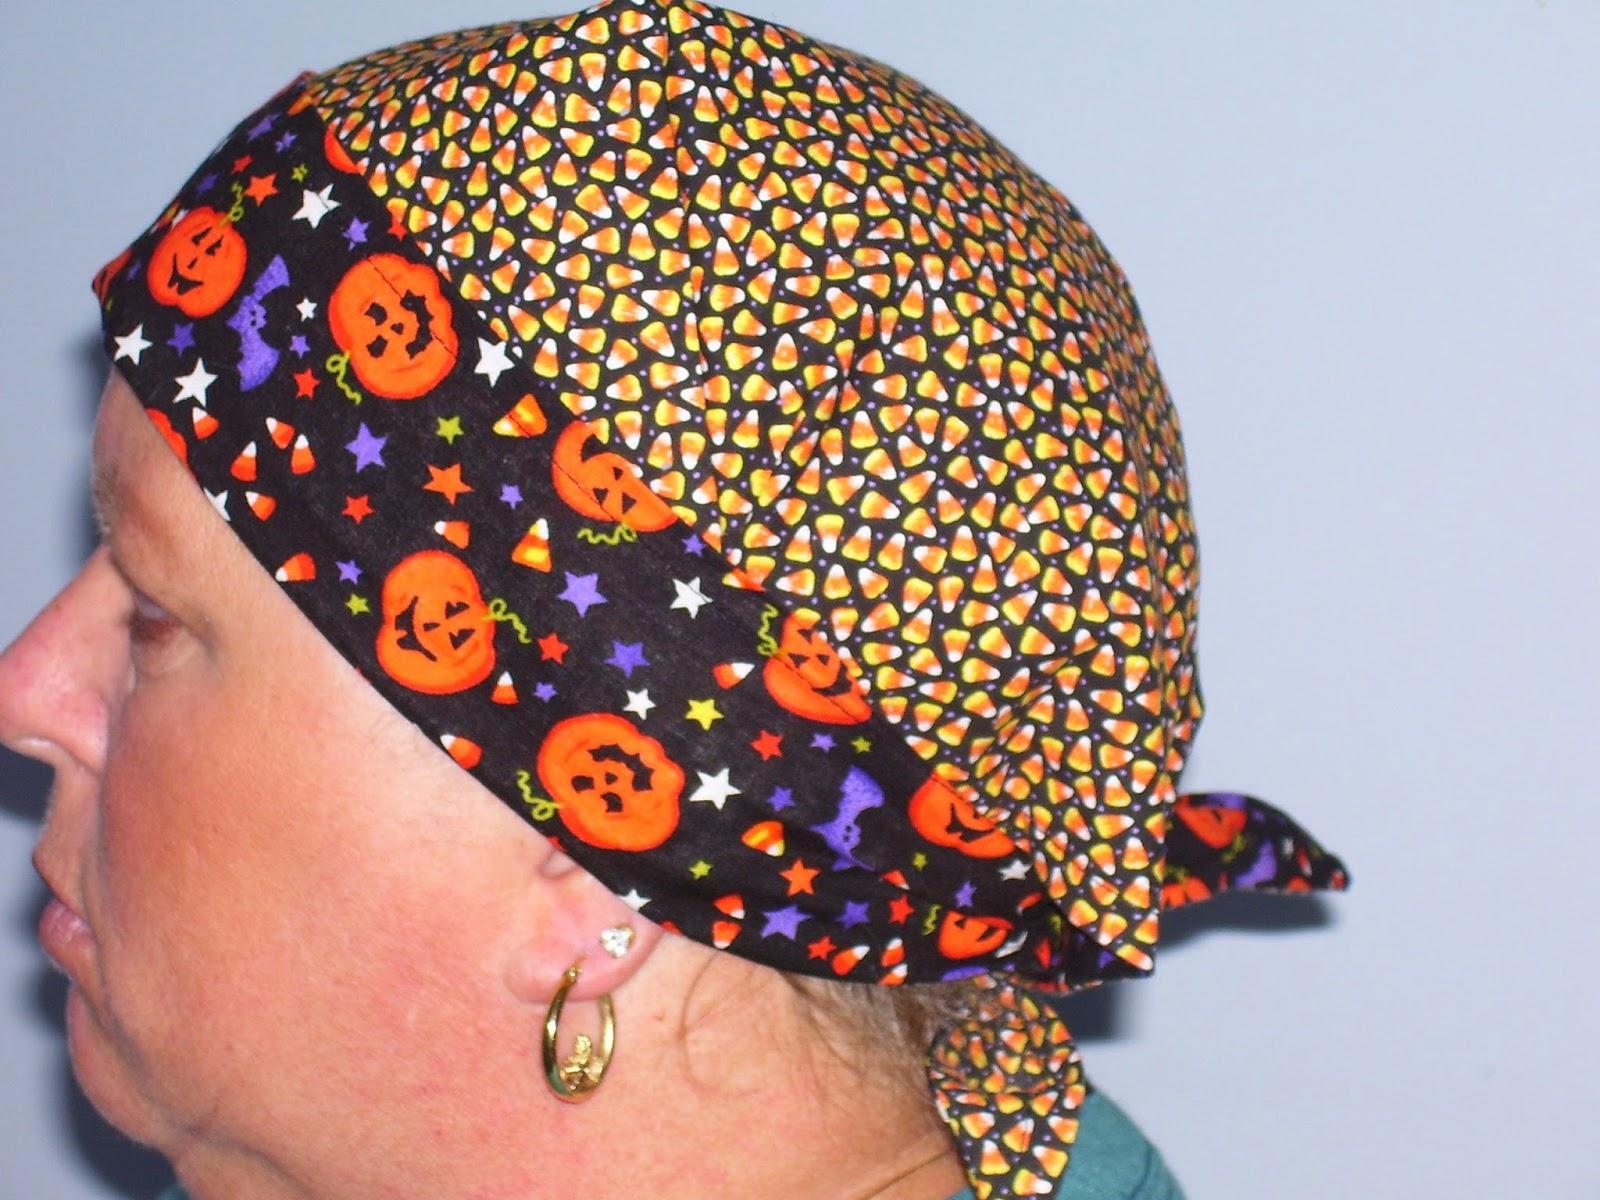 22 Applegate Lane: Chemo Scarf Pattern